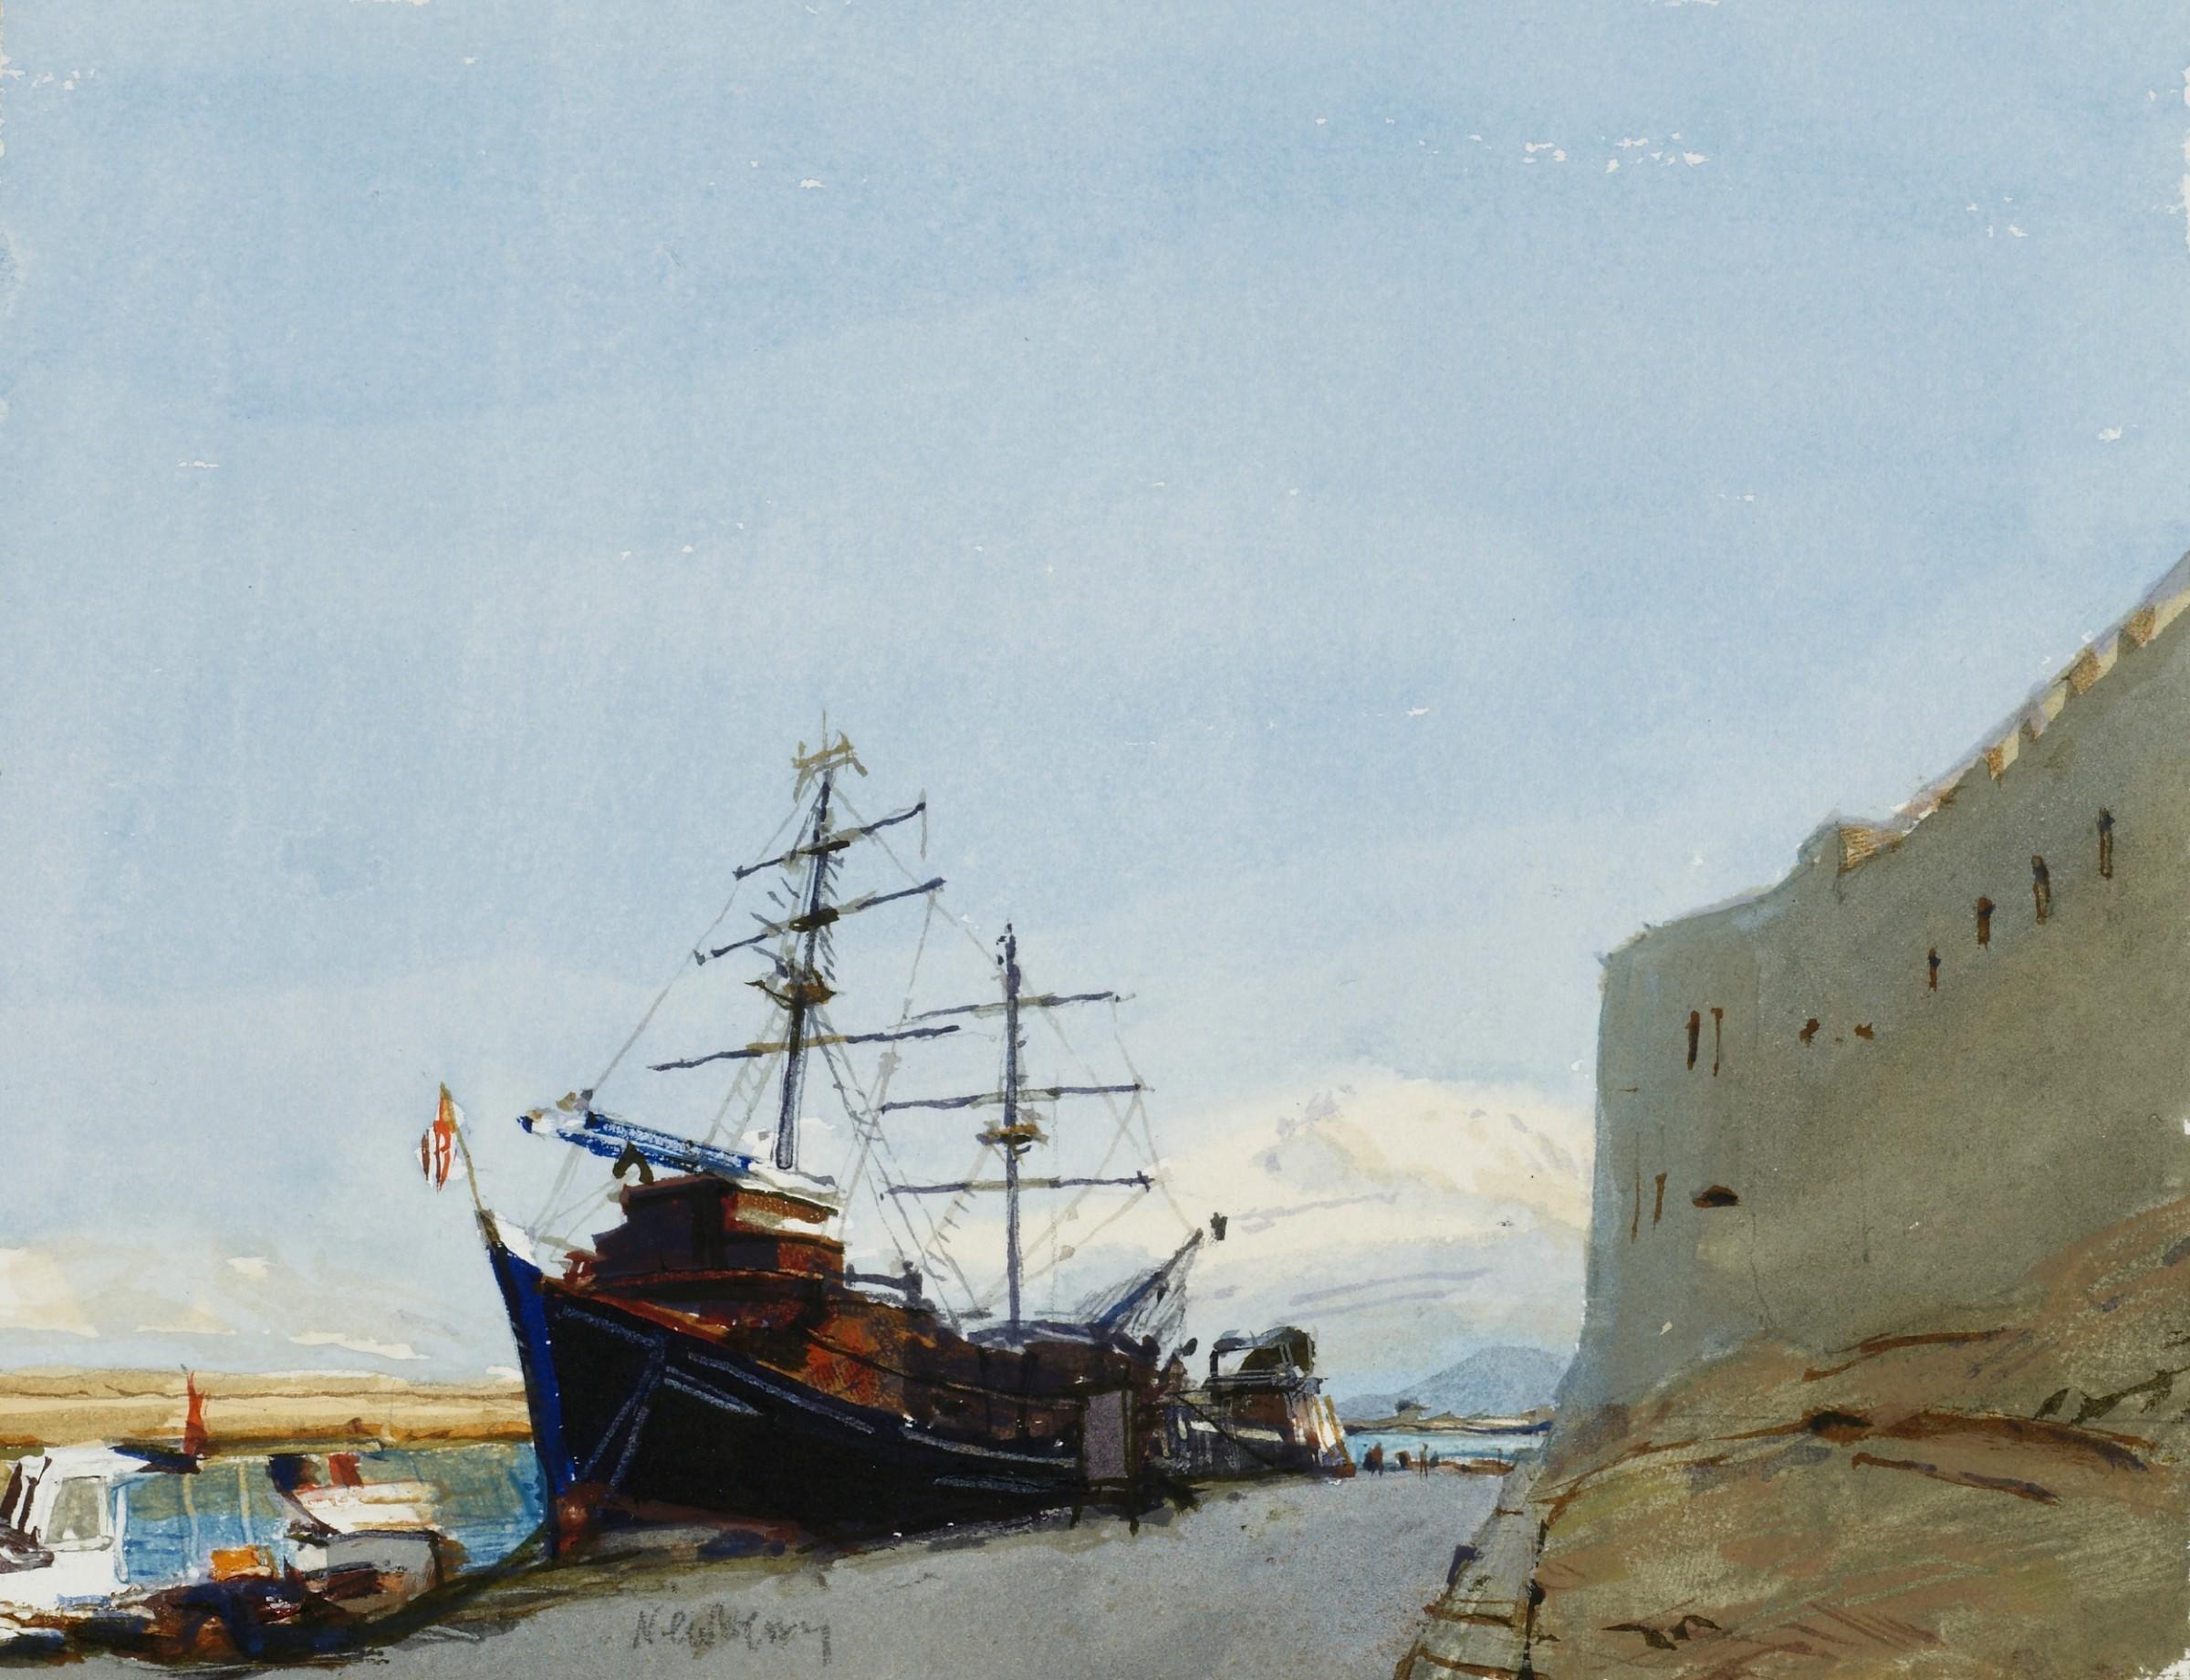 "<span class=""link fancybox-details-link""><a href=""/artists/86-john-newberry/works/12519-john-newberry-ships-in-kyrenia-harbour/"">View Detail Page</a></span><div class=""artist""><span class=""artist""><strong>John Newberry</strong></span></div><div class=""title""><em>Ships in Kyrenia Harbour</em></div><div class=""medium"">watercolour</div><div class=""dimensions"">Frame: 33 x 37 cm<br /> Artwork: 18 x 22.5 cm</div><div class=""price"">£320.00</div>"